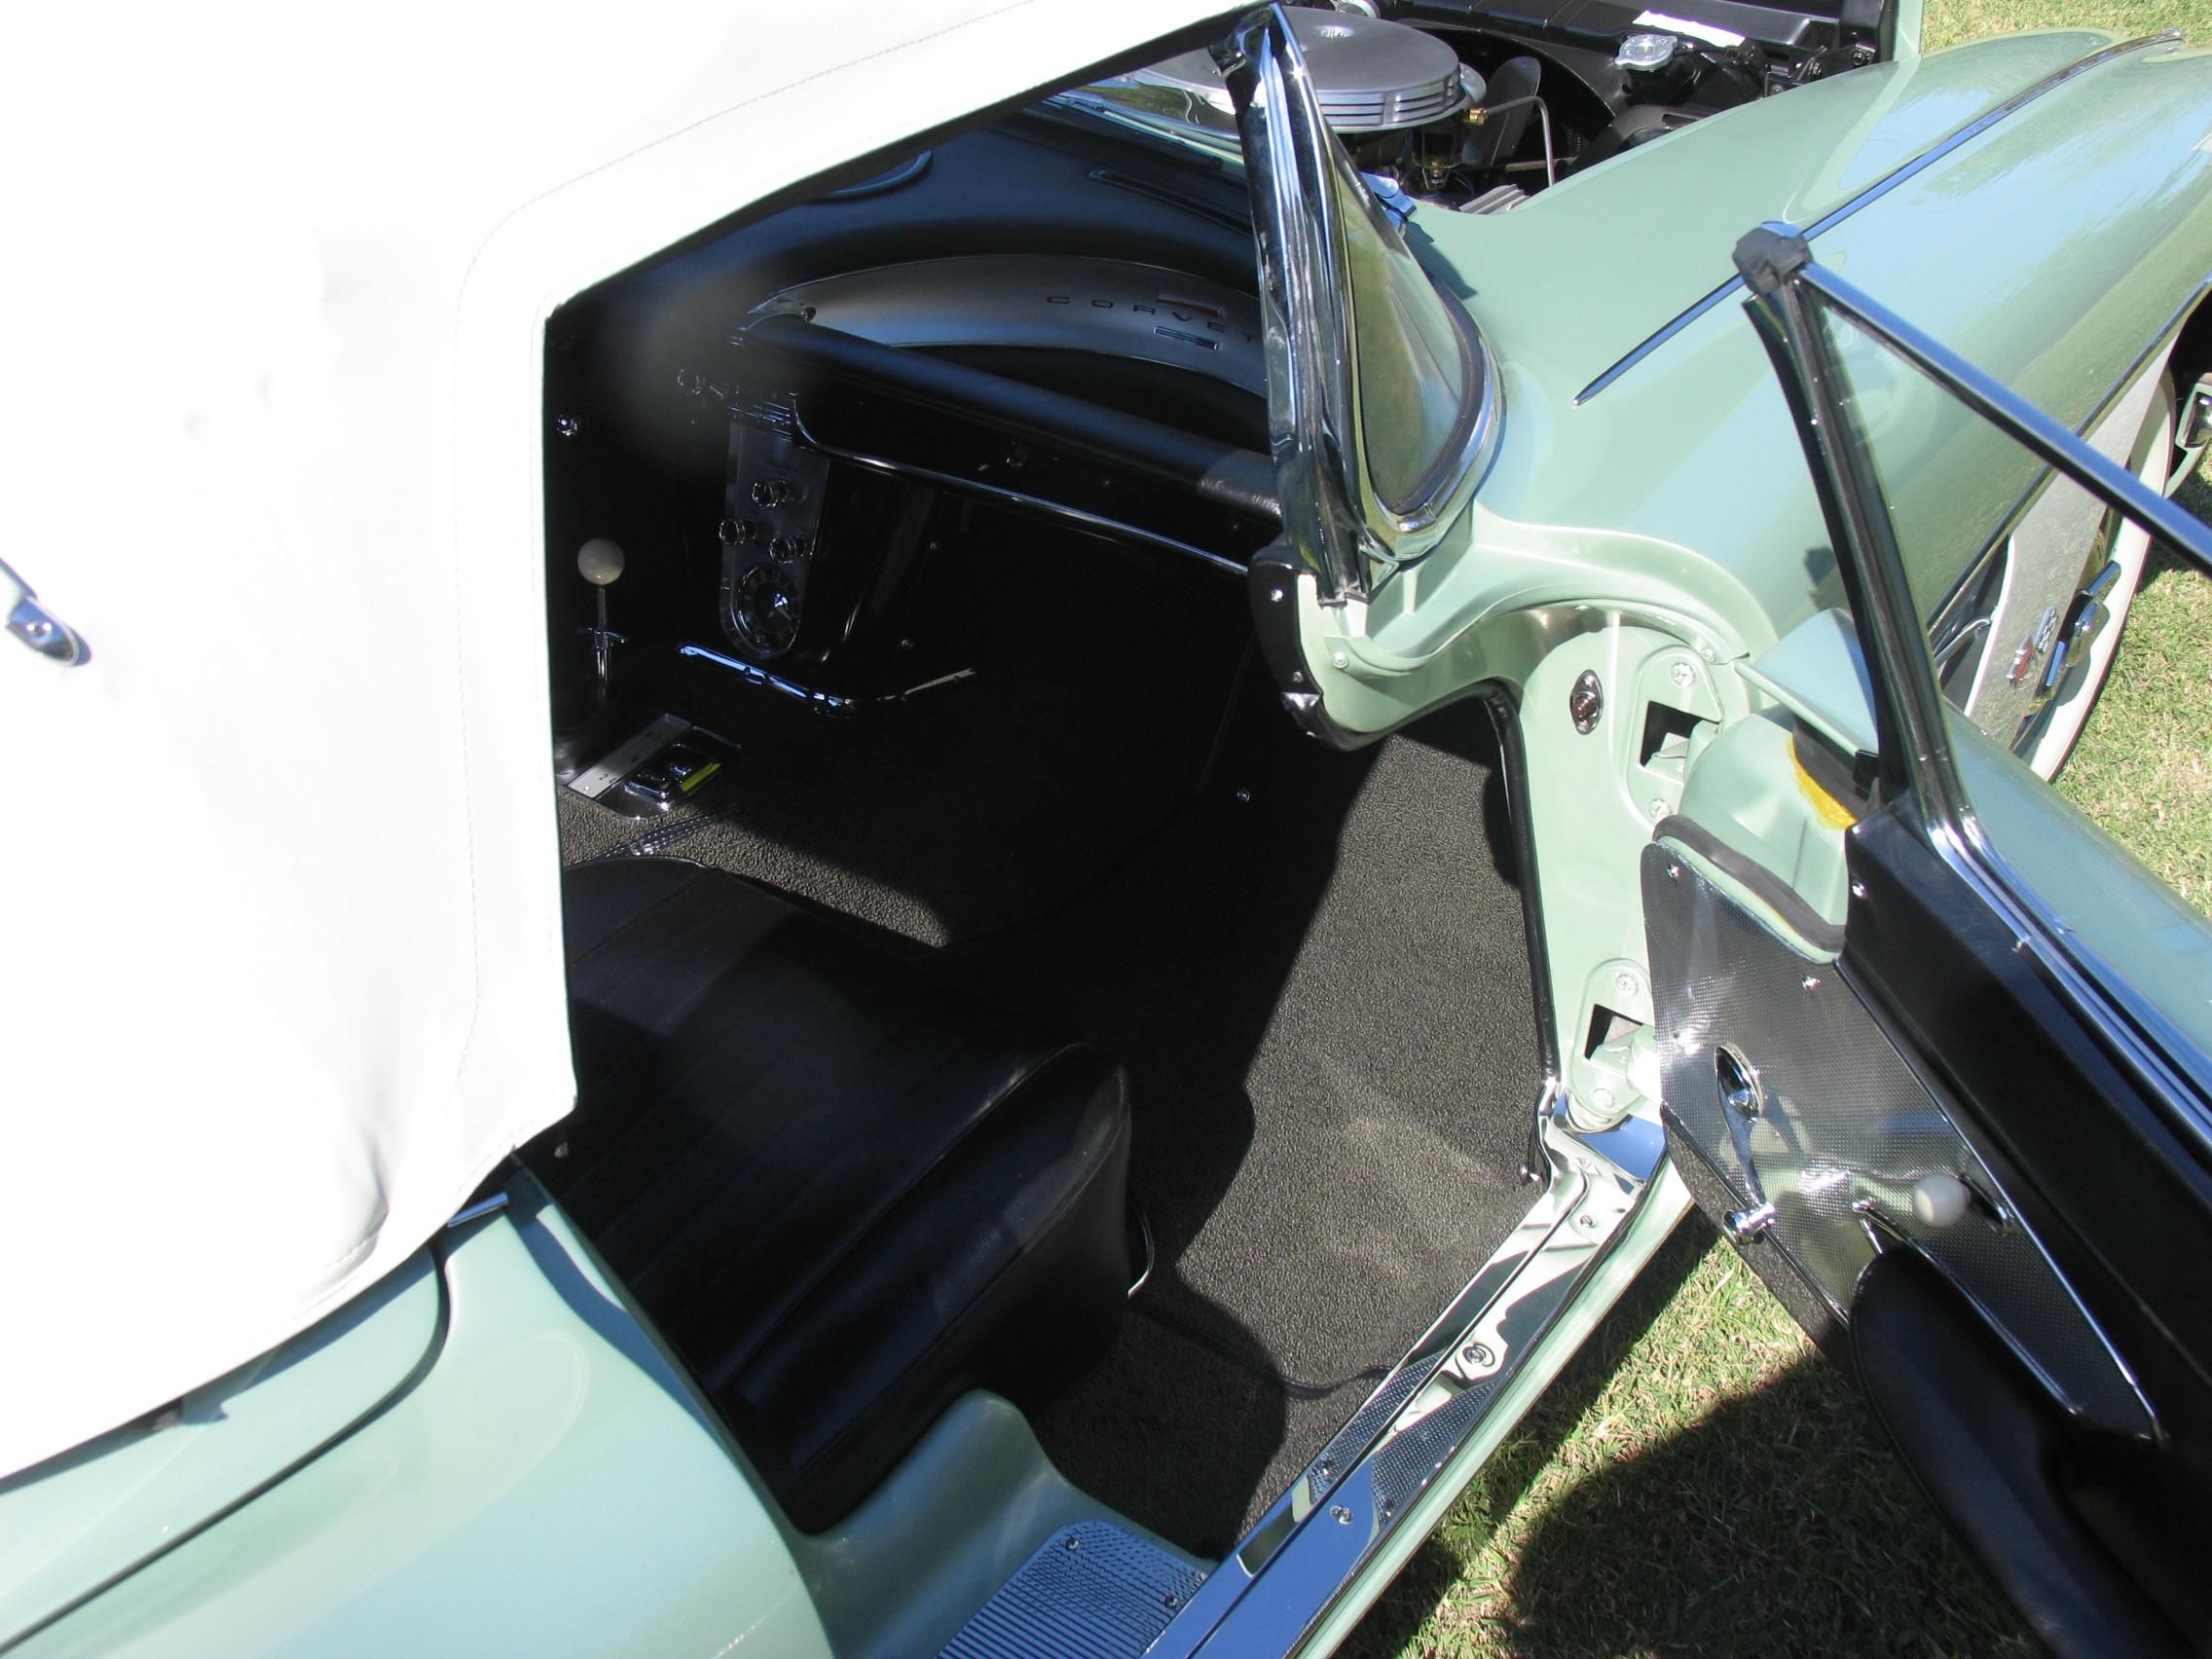 1960 corvette sinor prestige automobiles inc 1960 chevrolet corvette 00867s101789. Black Bedroom Furniture Sets. Home Design Ideas